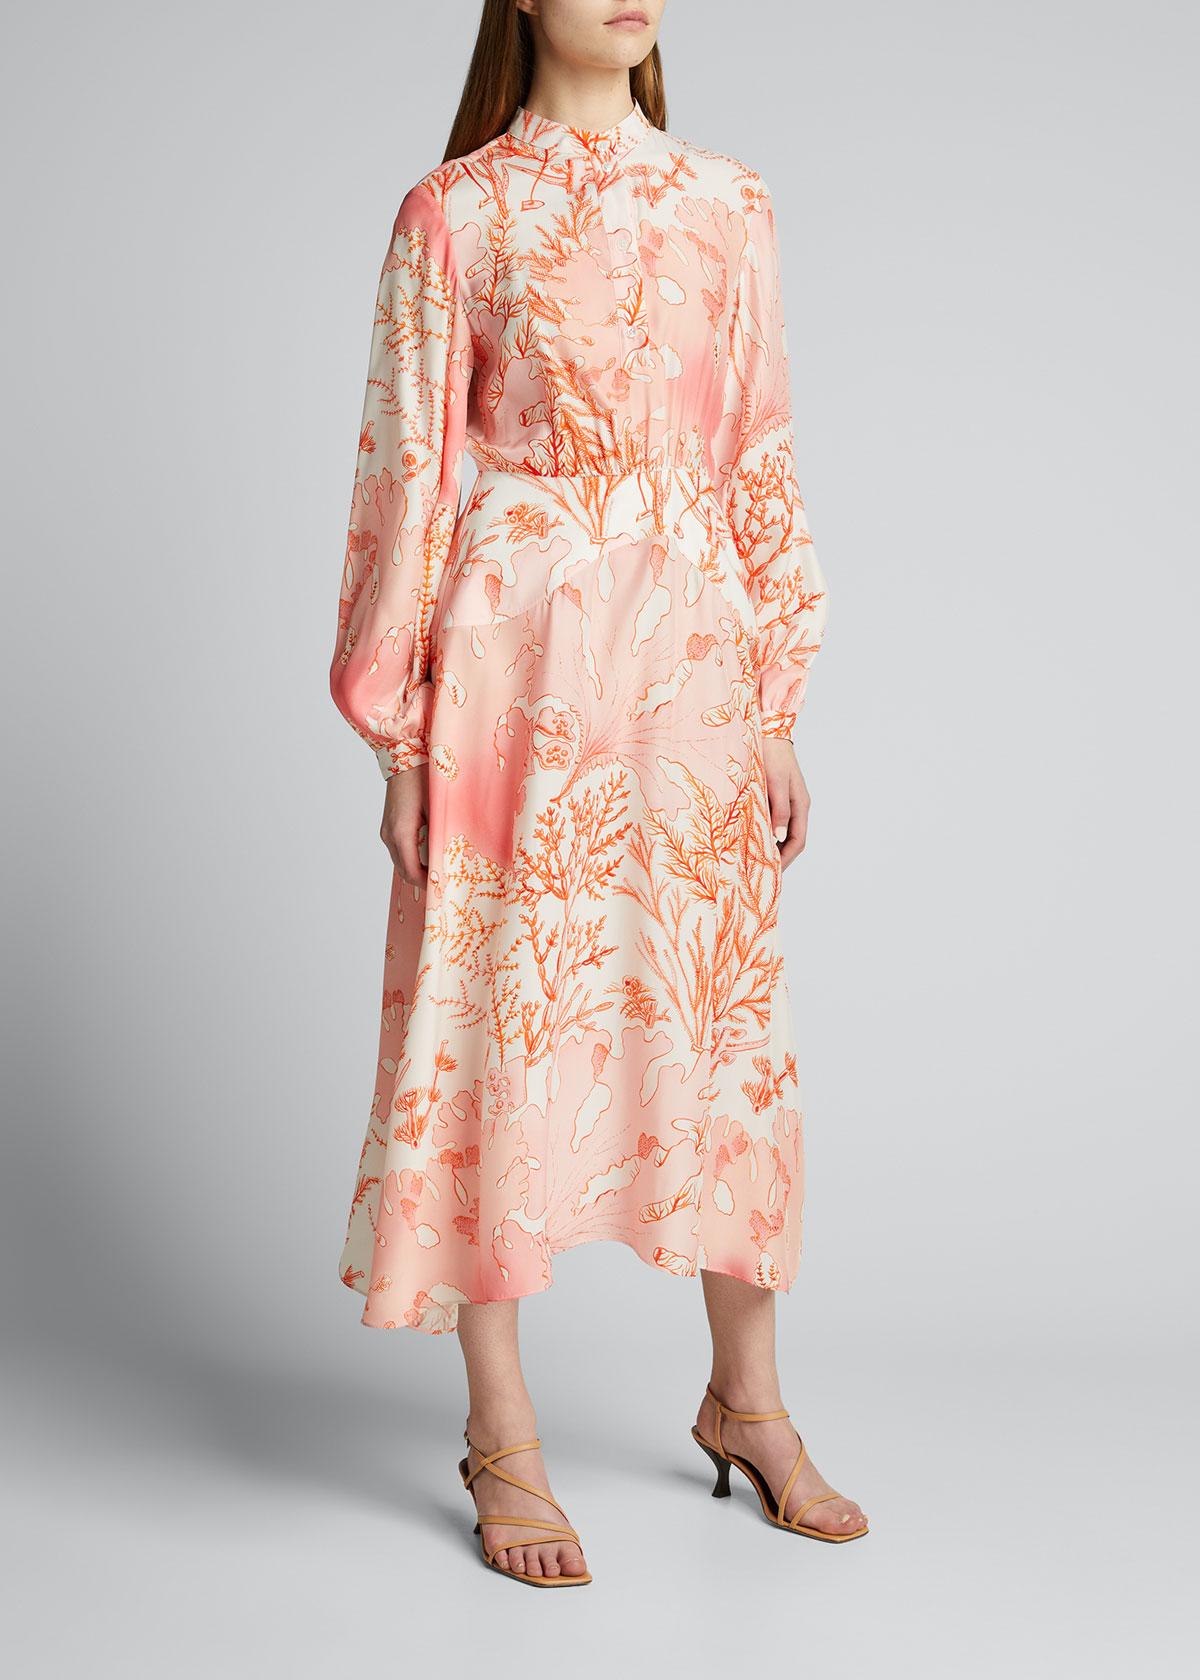 Stella Mccartney Clothing CORAL-PRINT SILK MAXI DRESS